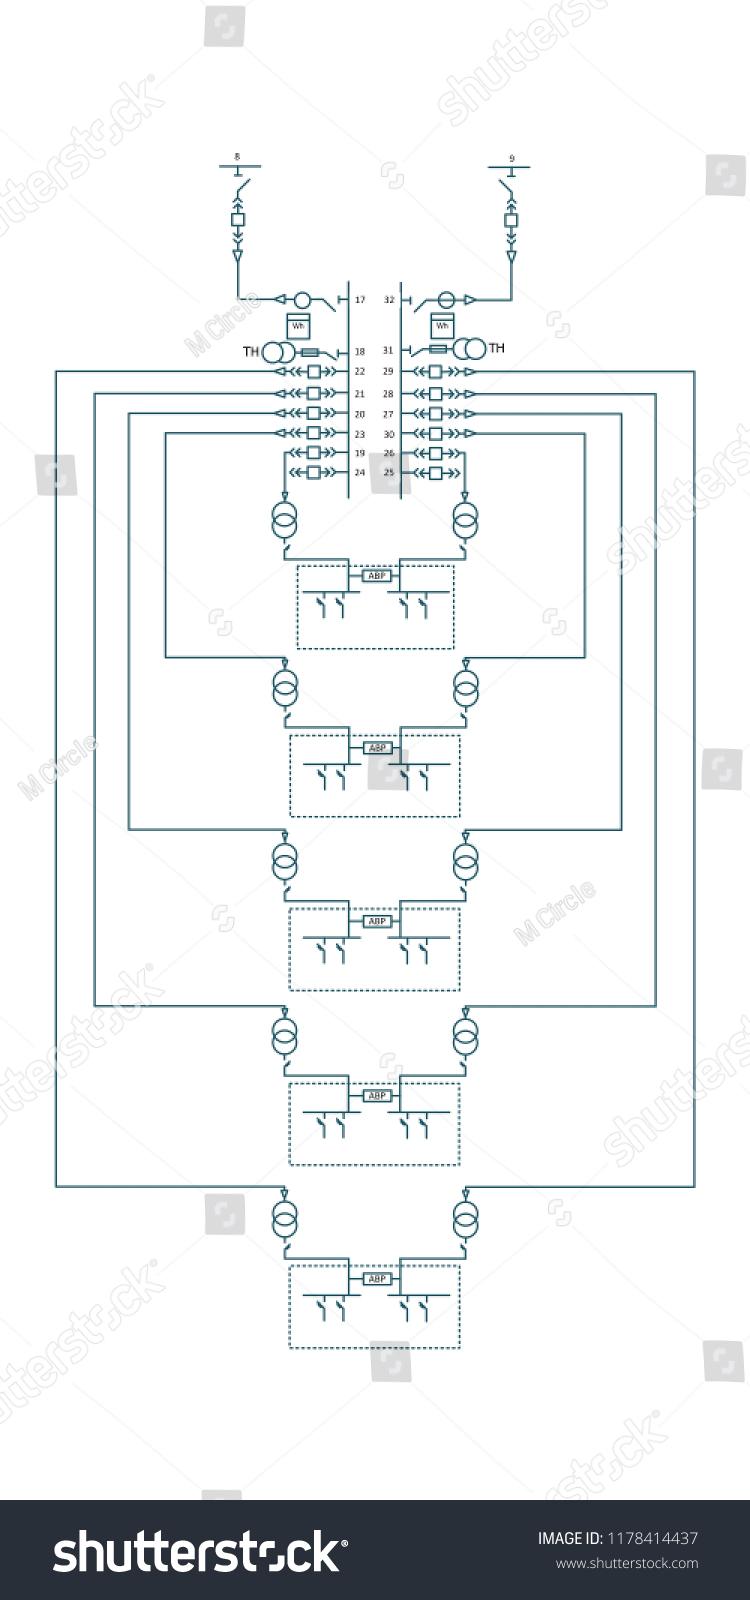 Wiring Diagram Transformer